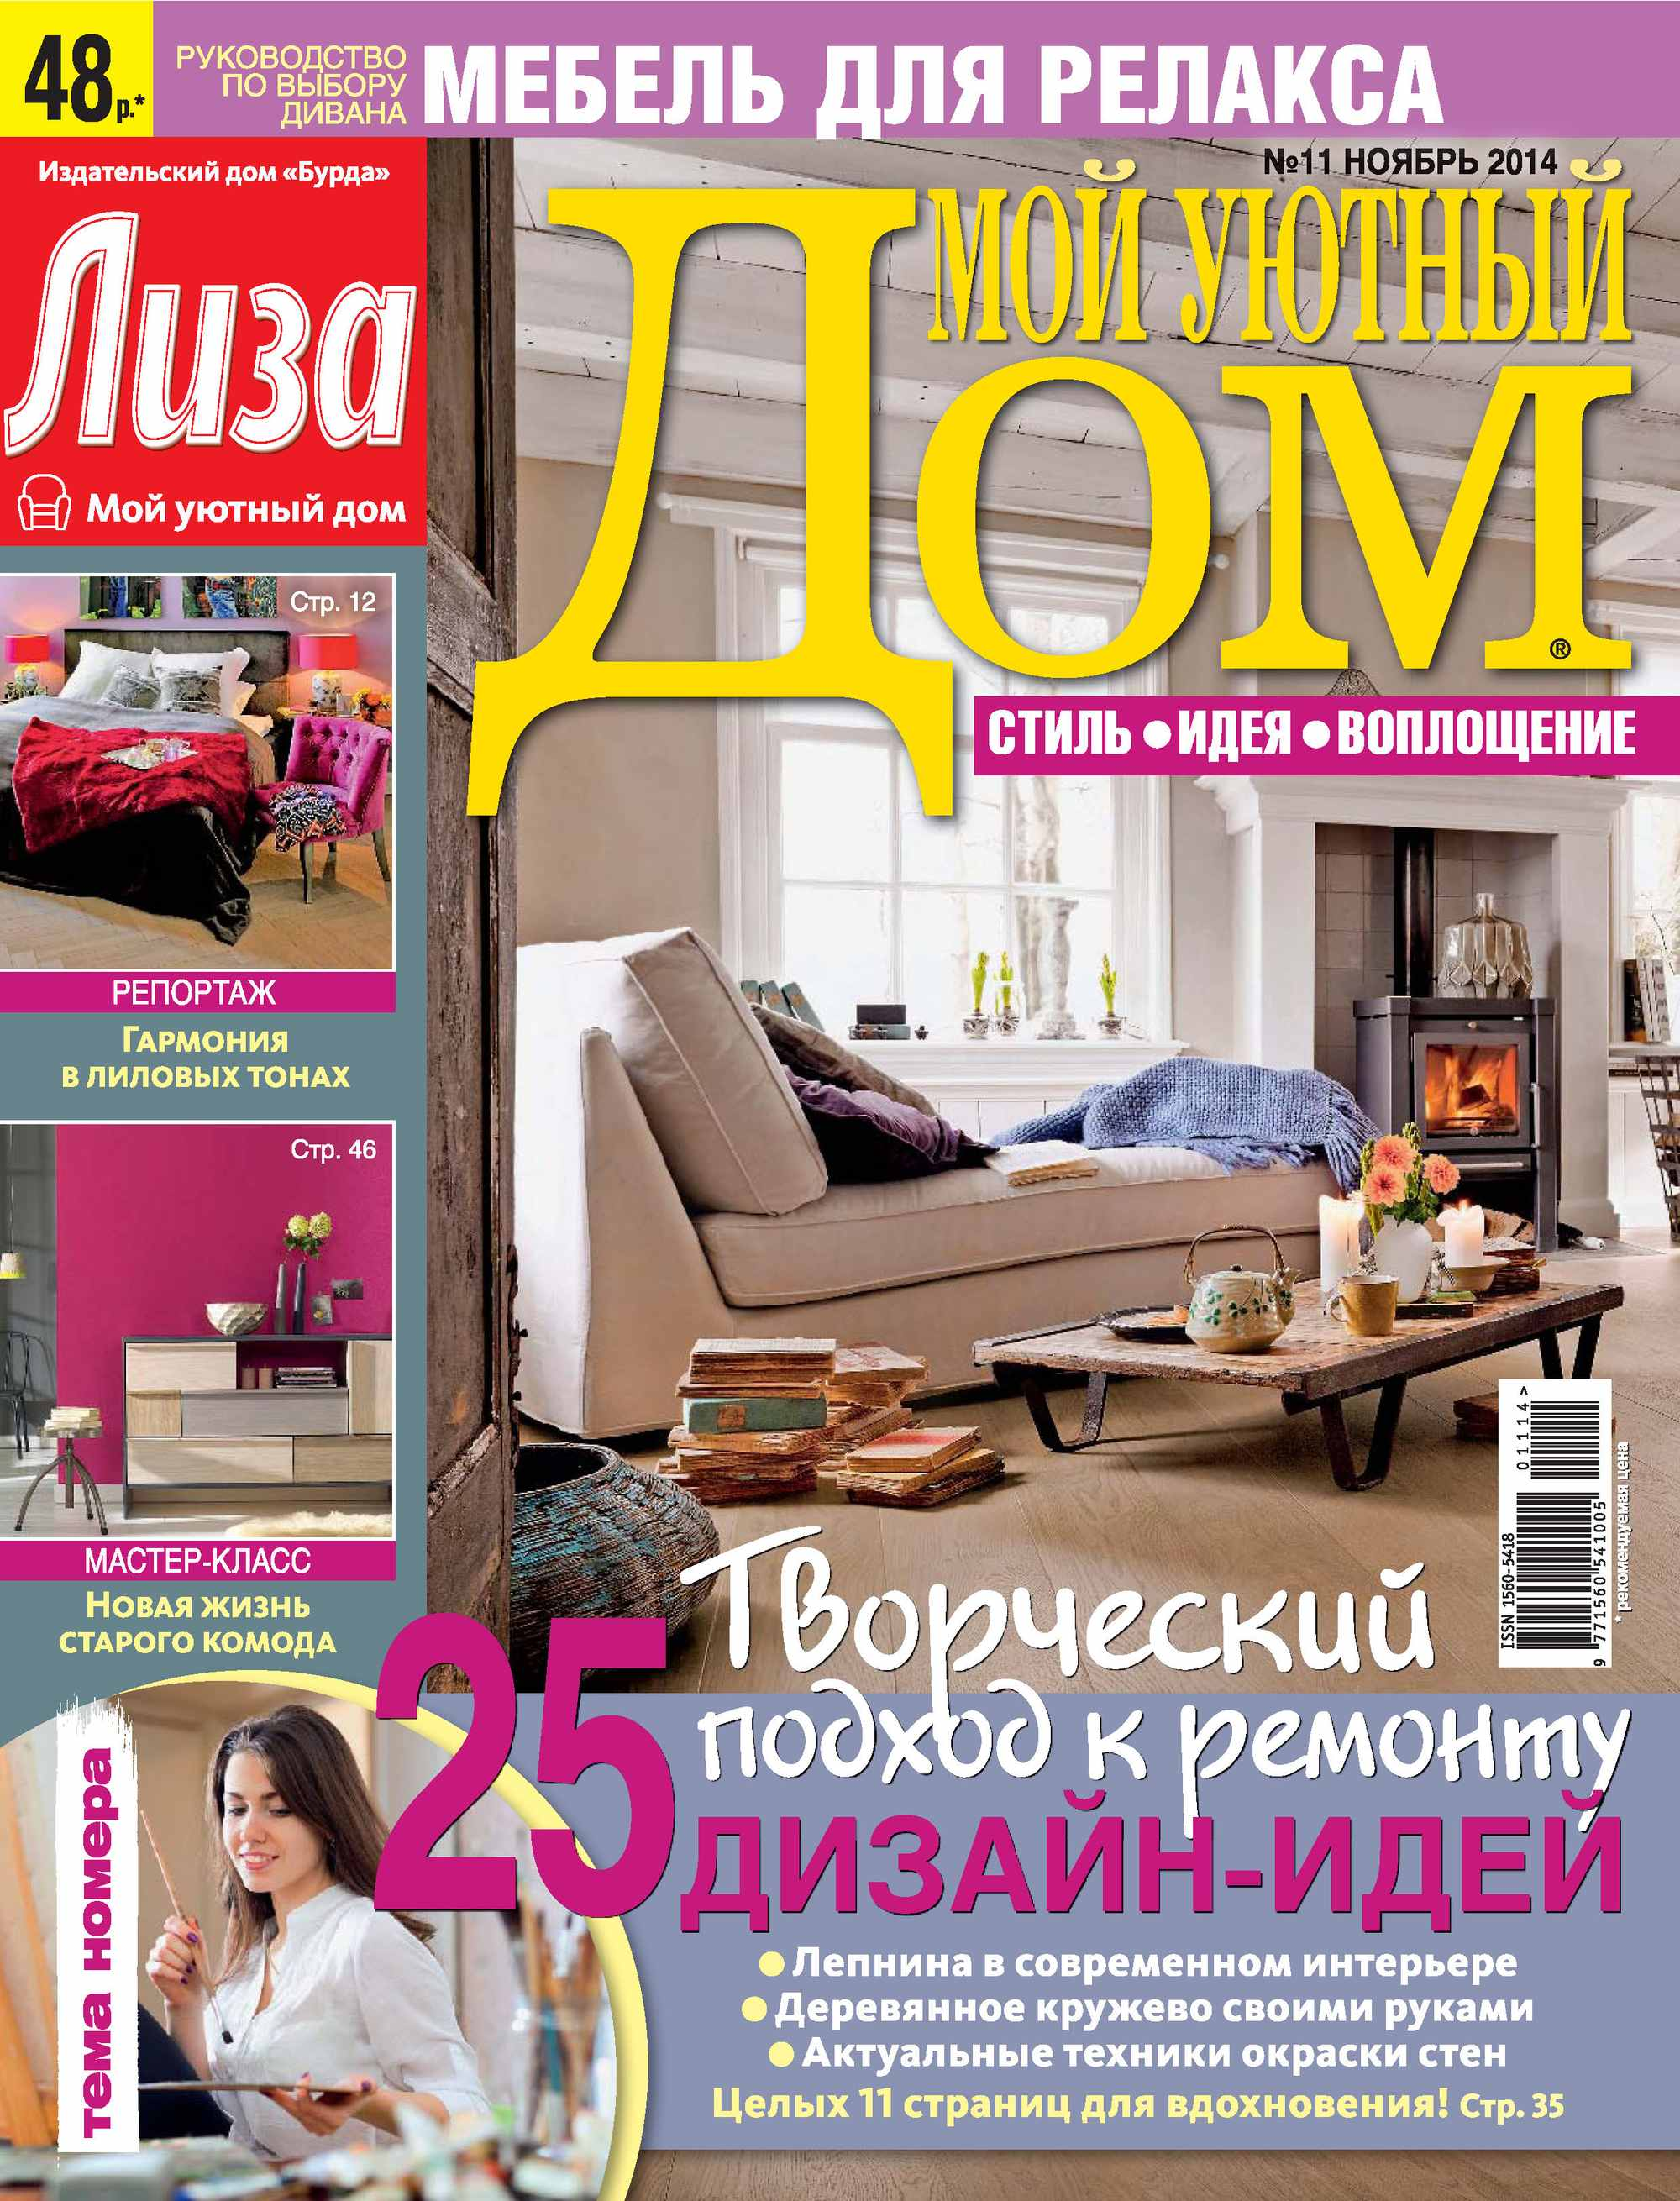 ИД «Бурда» Журнал «Лиза. Мой уютный дом» №11/2014 ид бурда журнал лиза мой уютный дом 04 2014